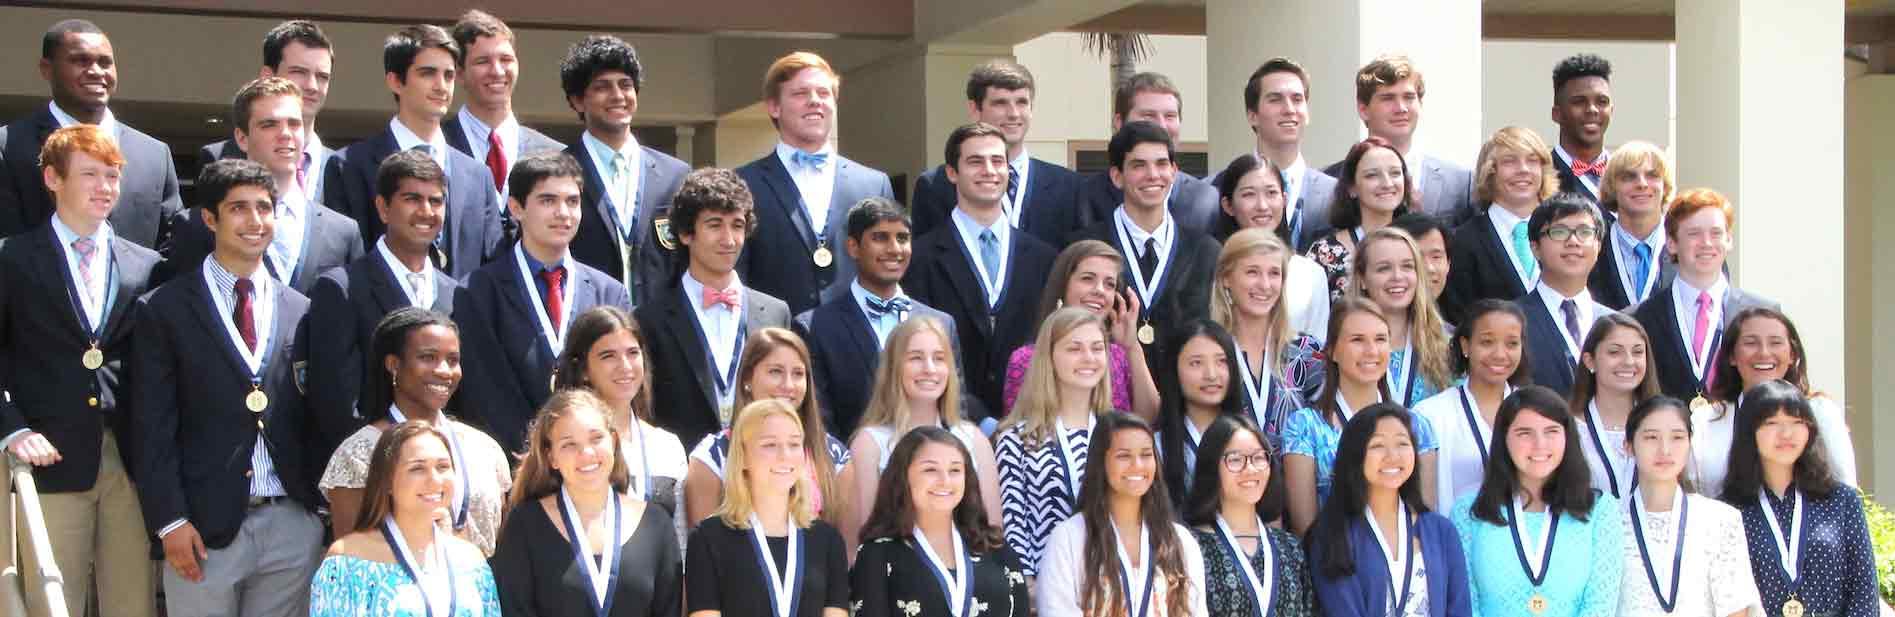 Graduating Class of International and American high school students Florida